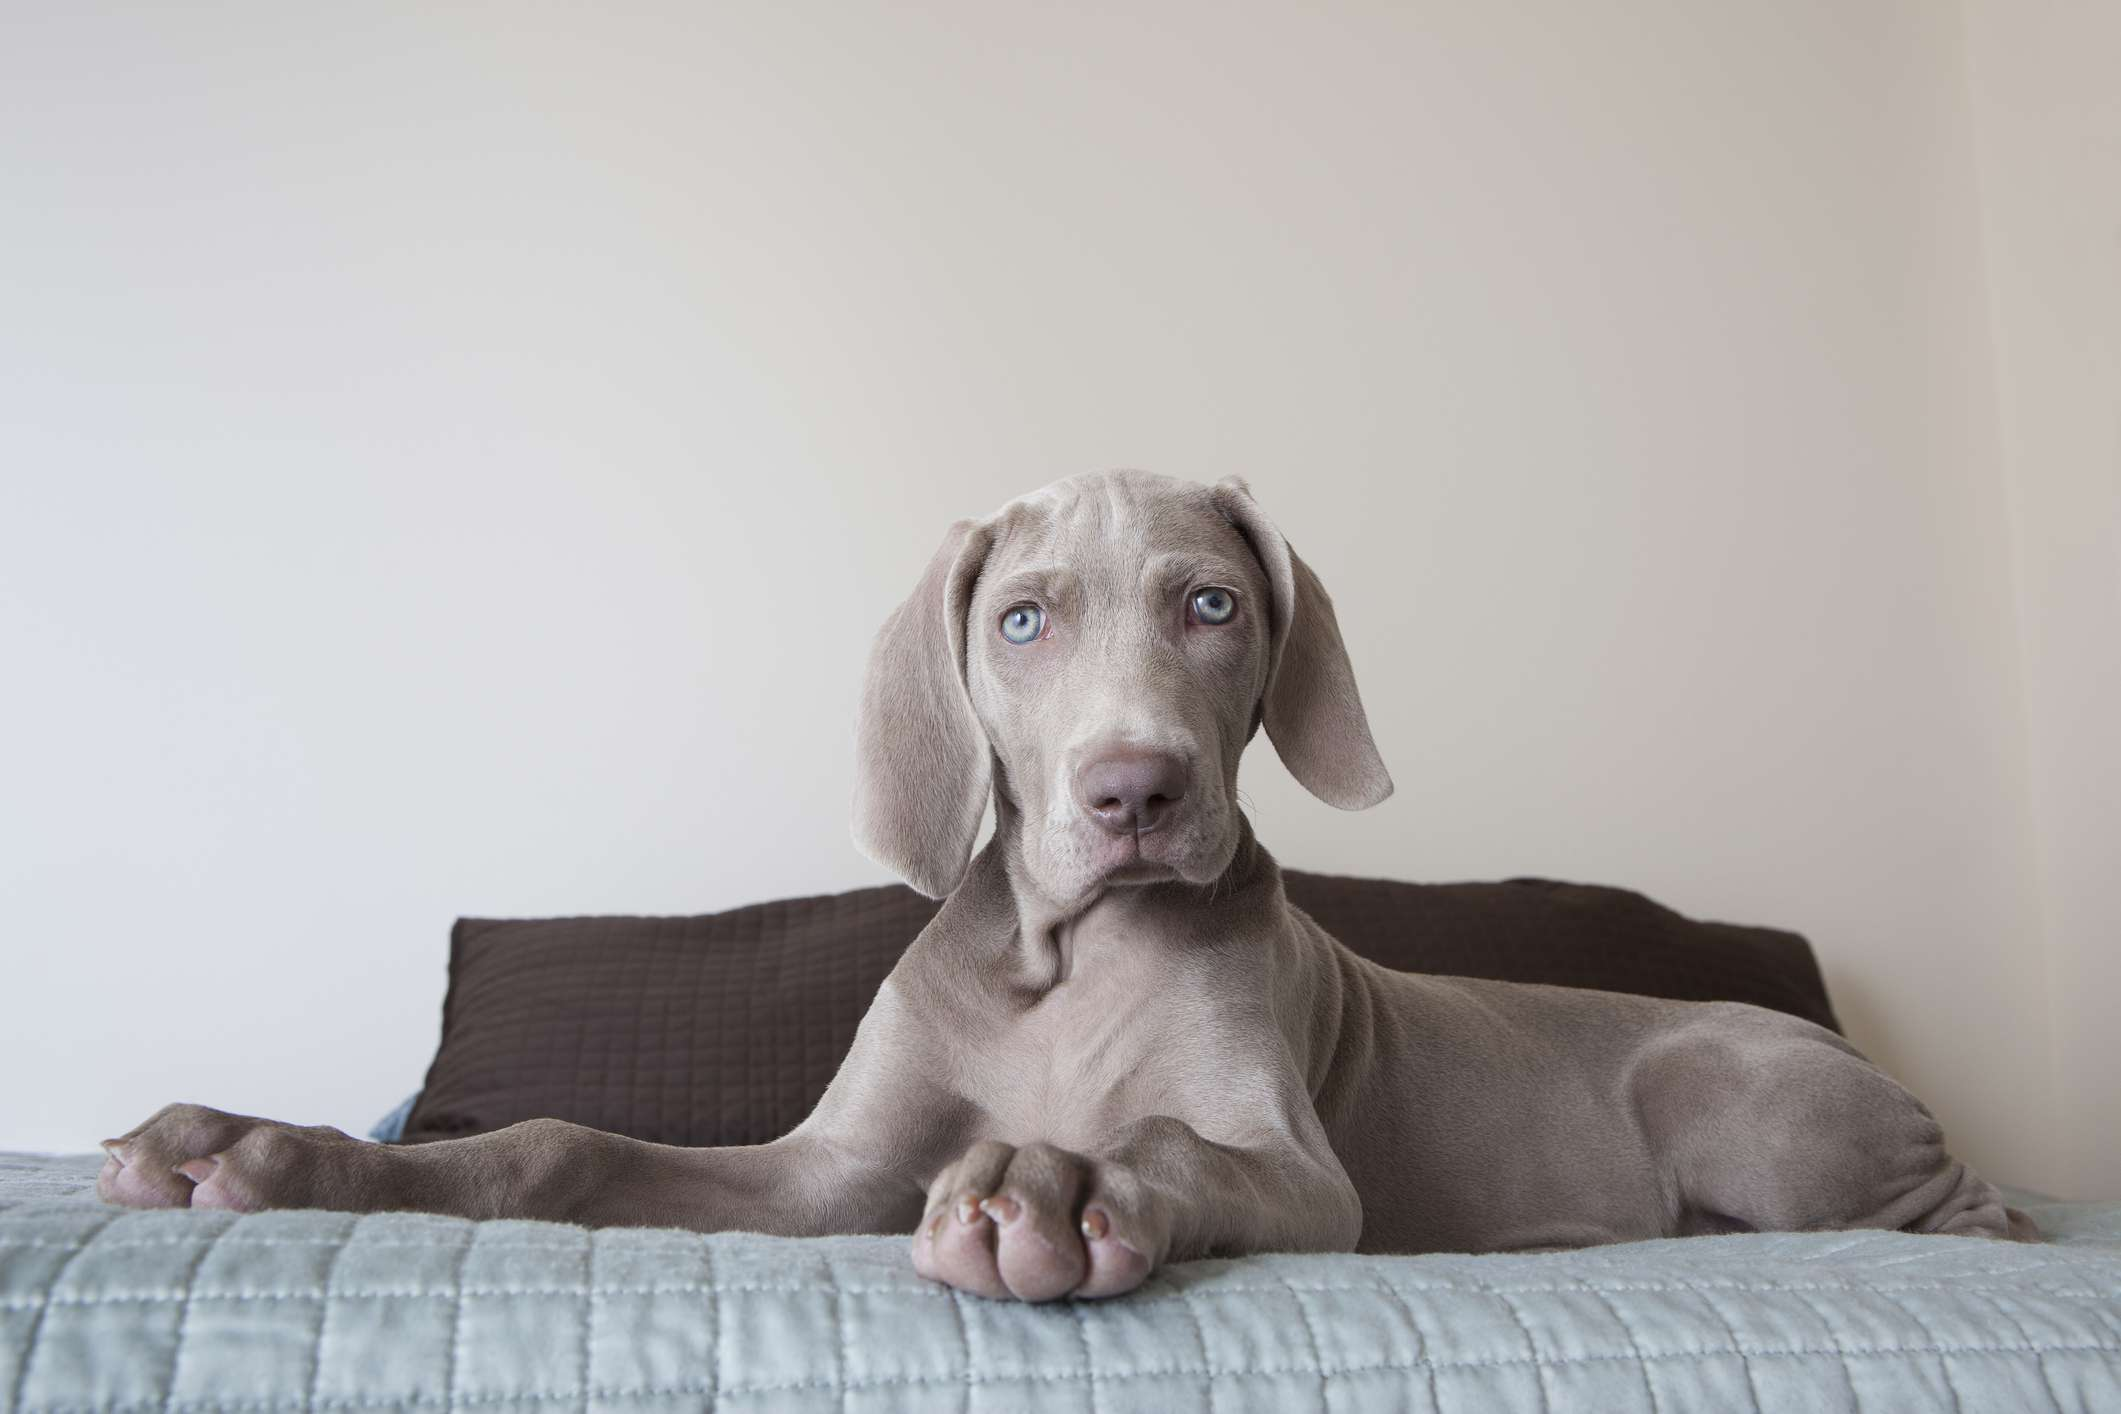 A Weimaraner puppy sitting up on a bed